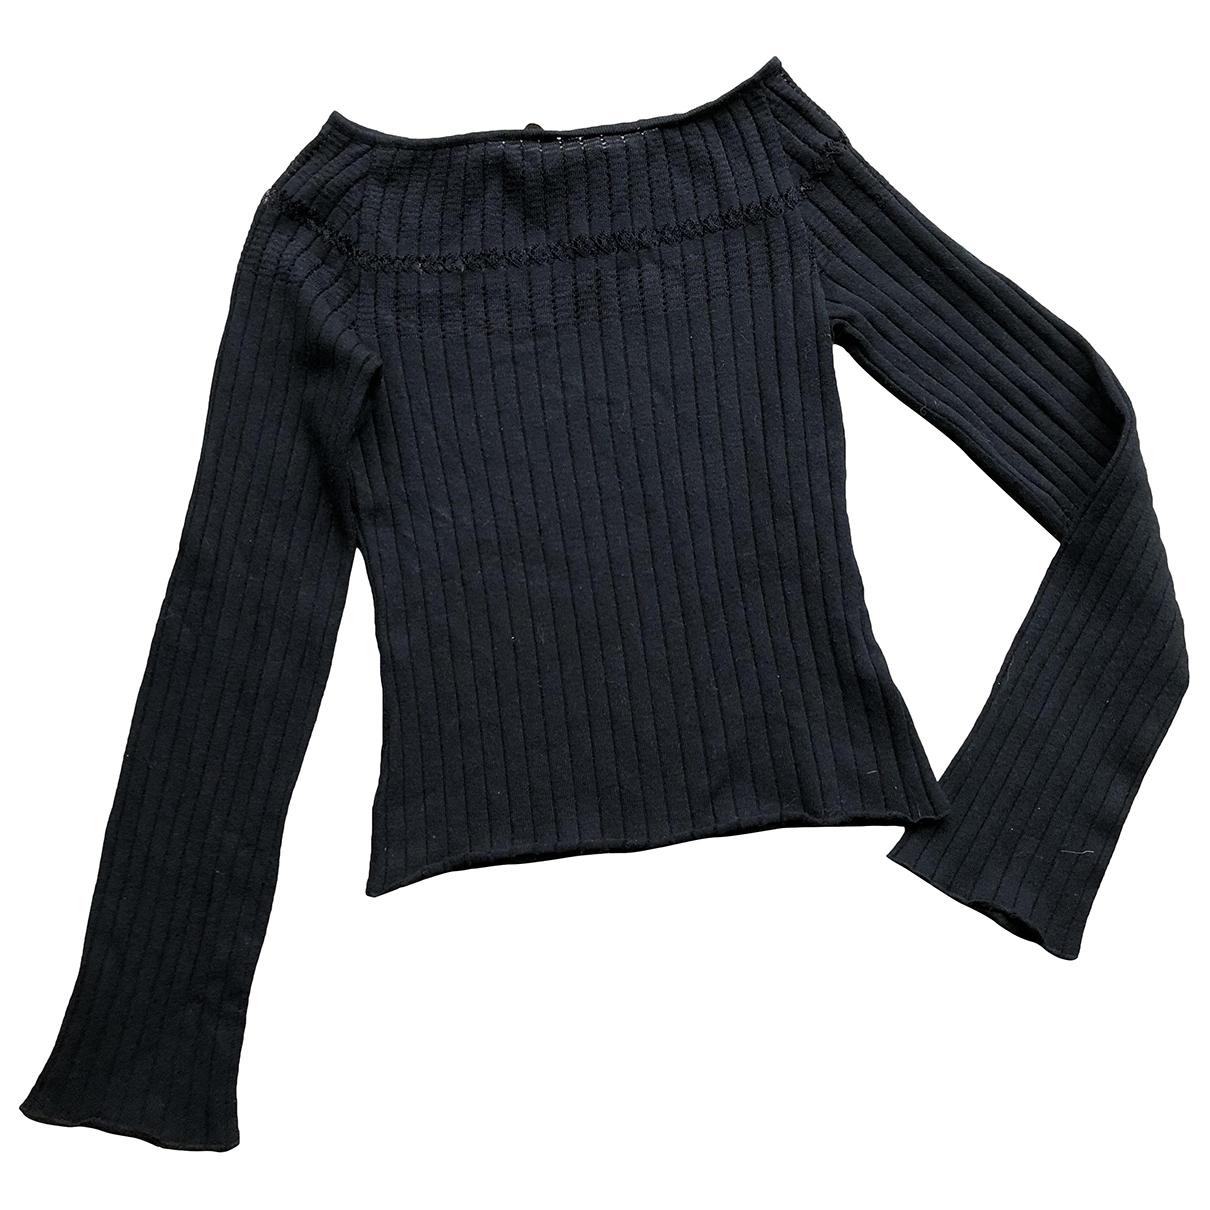 Class Cavalli \N Black Cotton Knitwear for Women S International